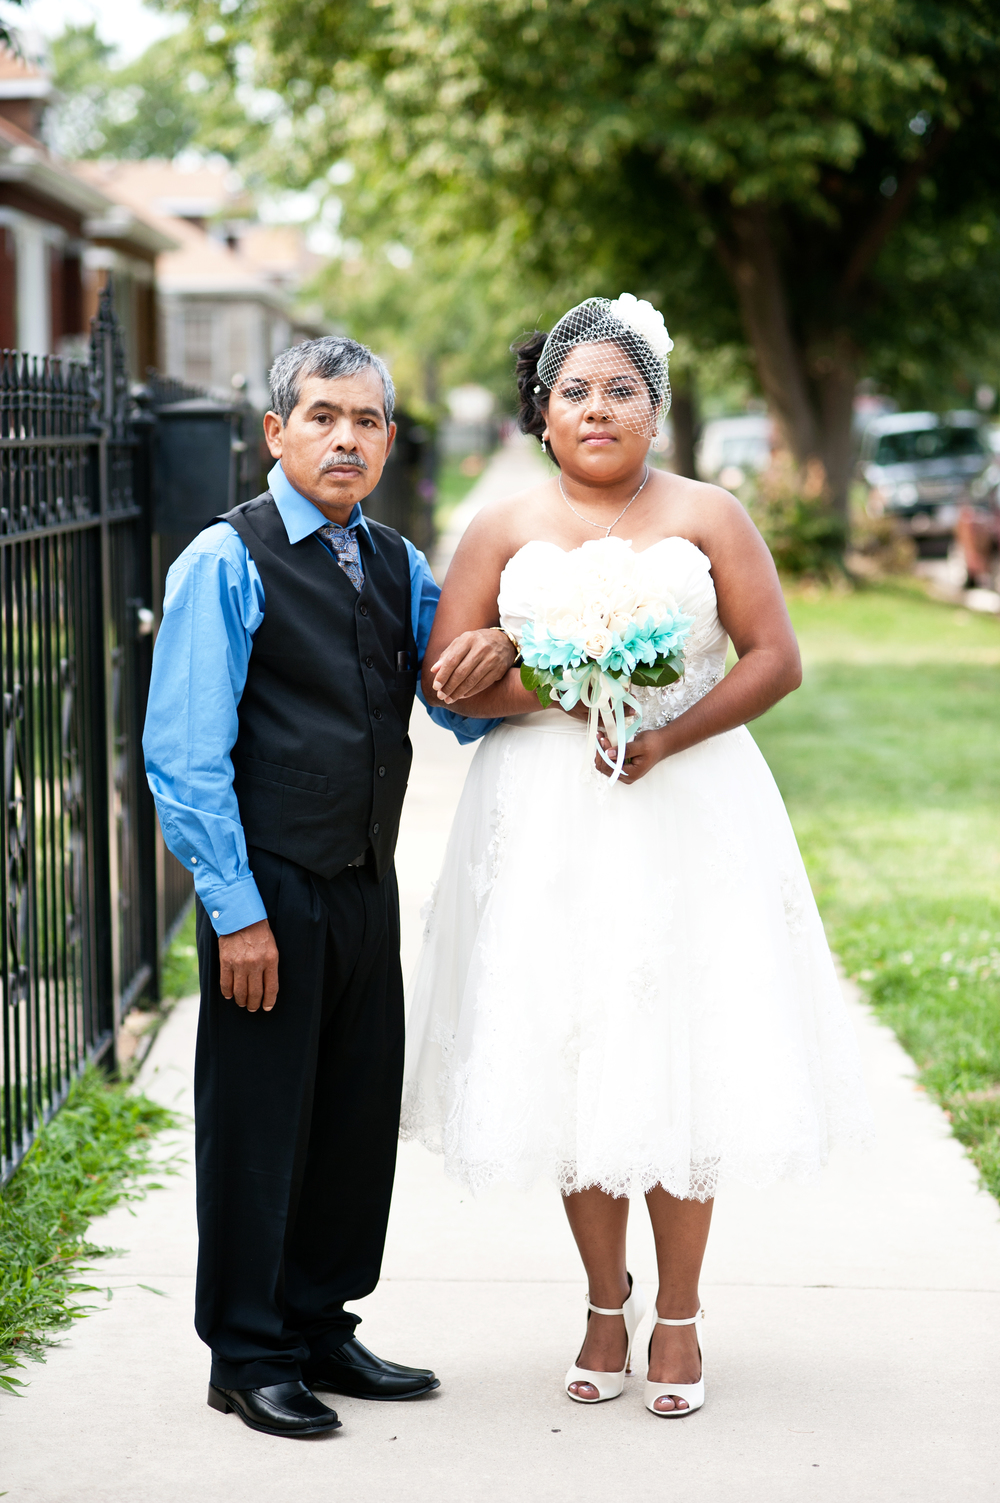 Urban Small Wedding Chicago Nomee Photography